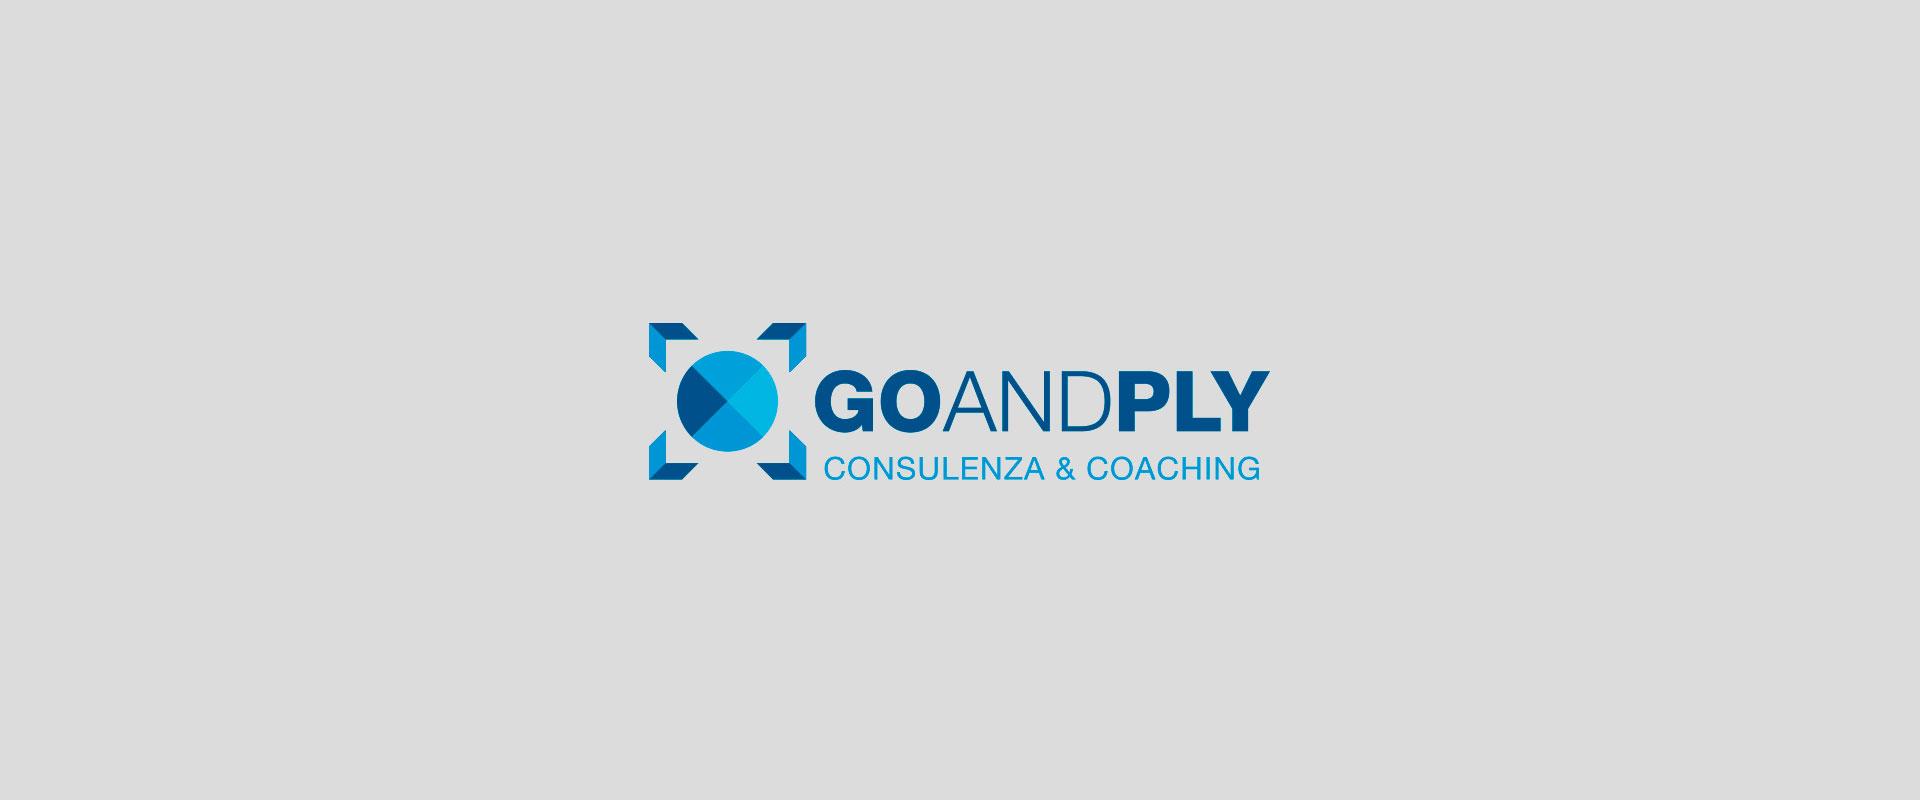 goandply-logo